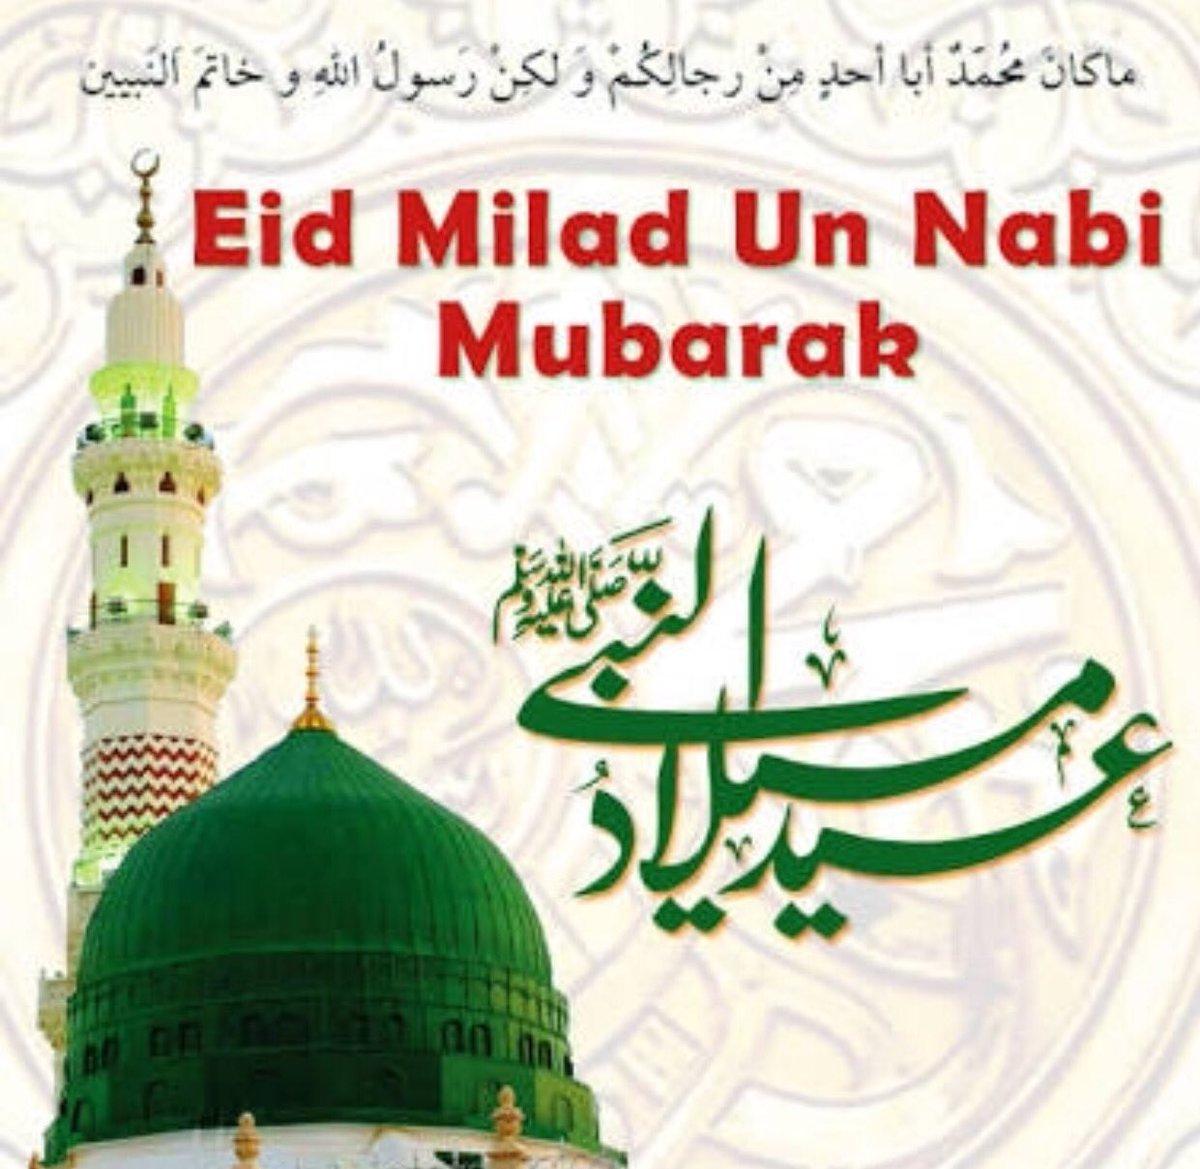 Amitabh Bachchan On Twitter T 3001 Tomorrow Is Eid Milad Un